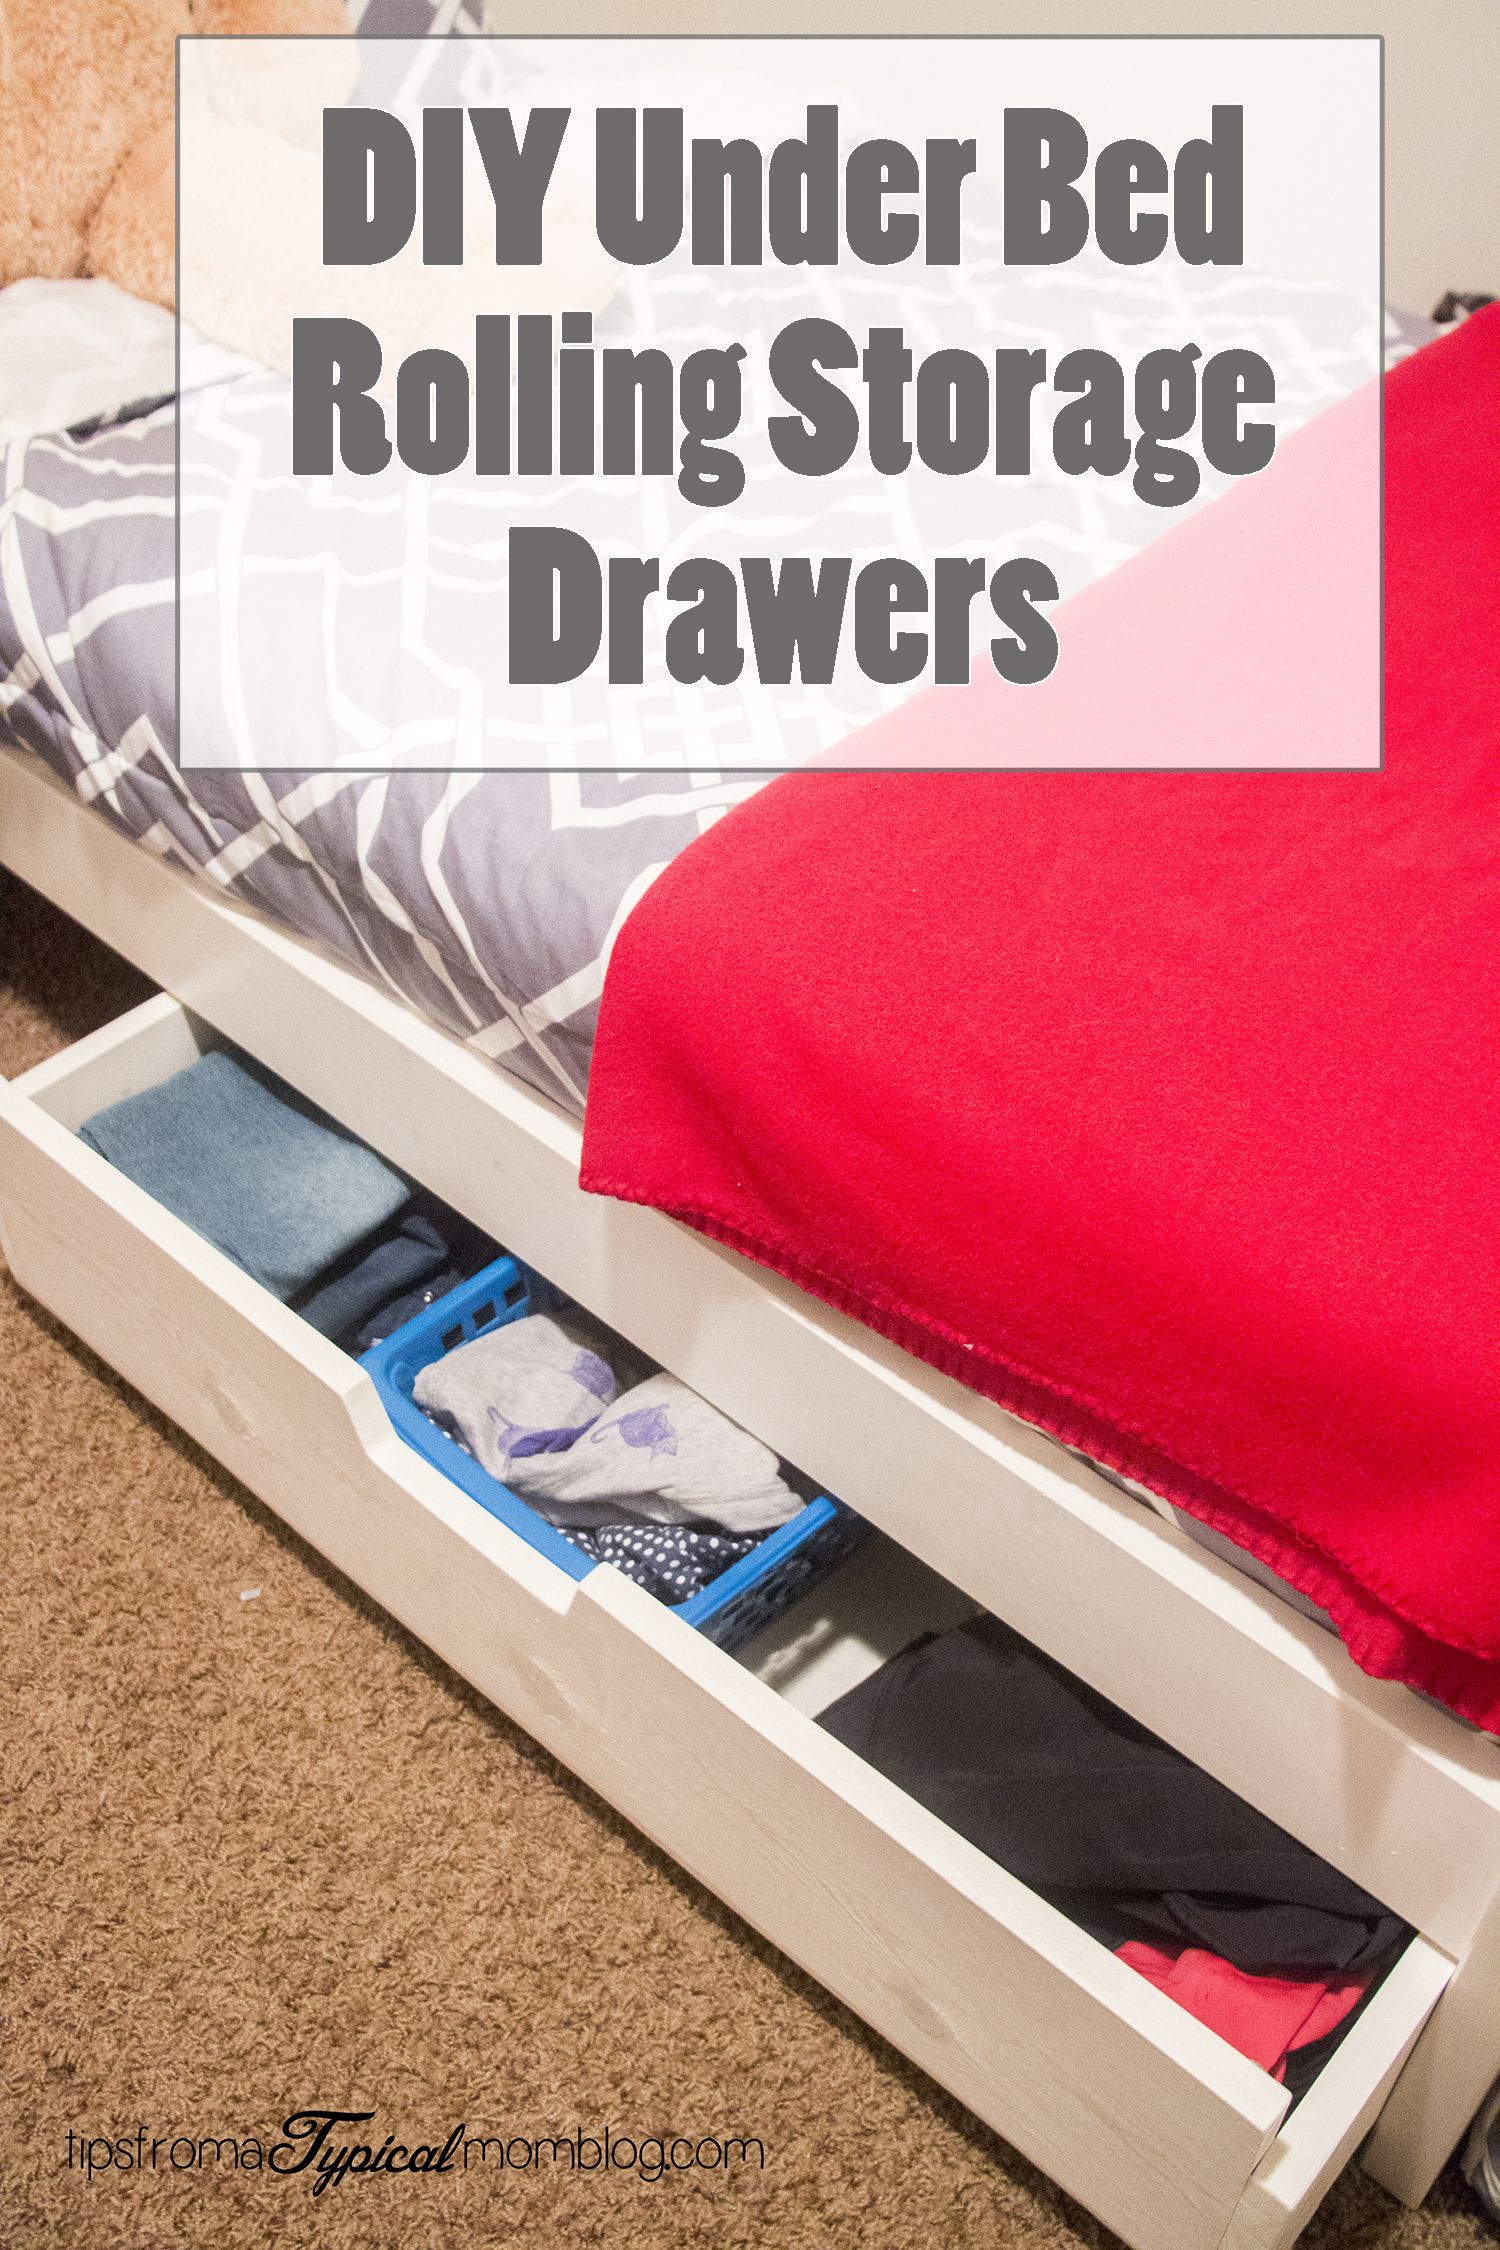 DIY Under Bed Rolling Storage Drawers Tutorial | Storage Drawers, DIY  Tutorial And Drawers